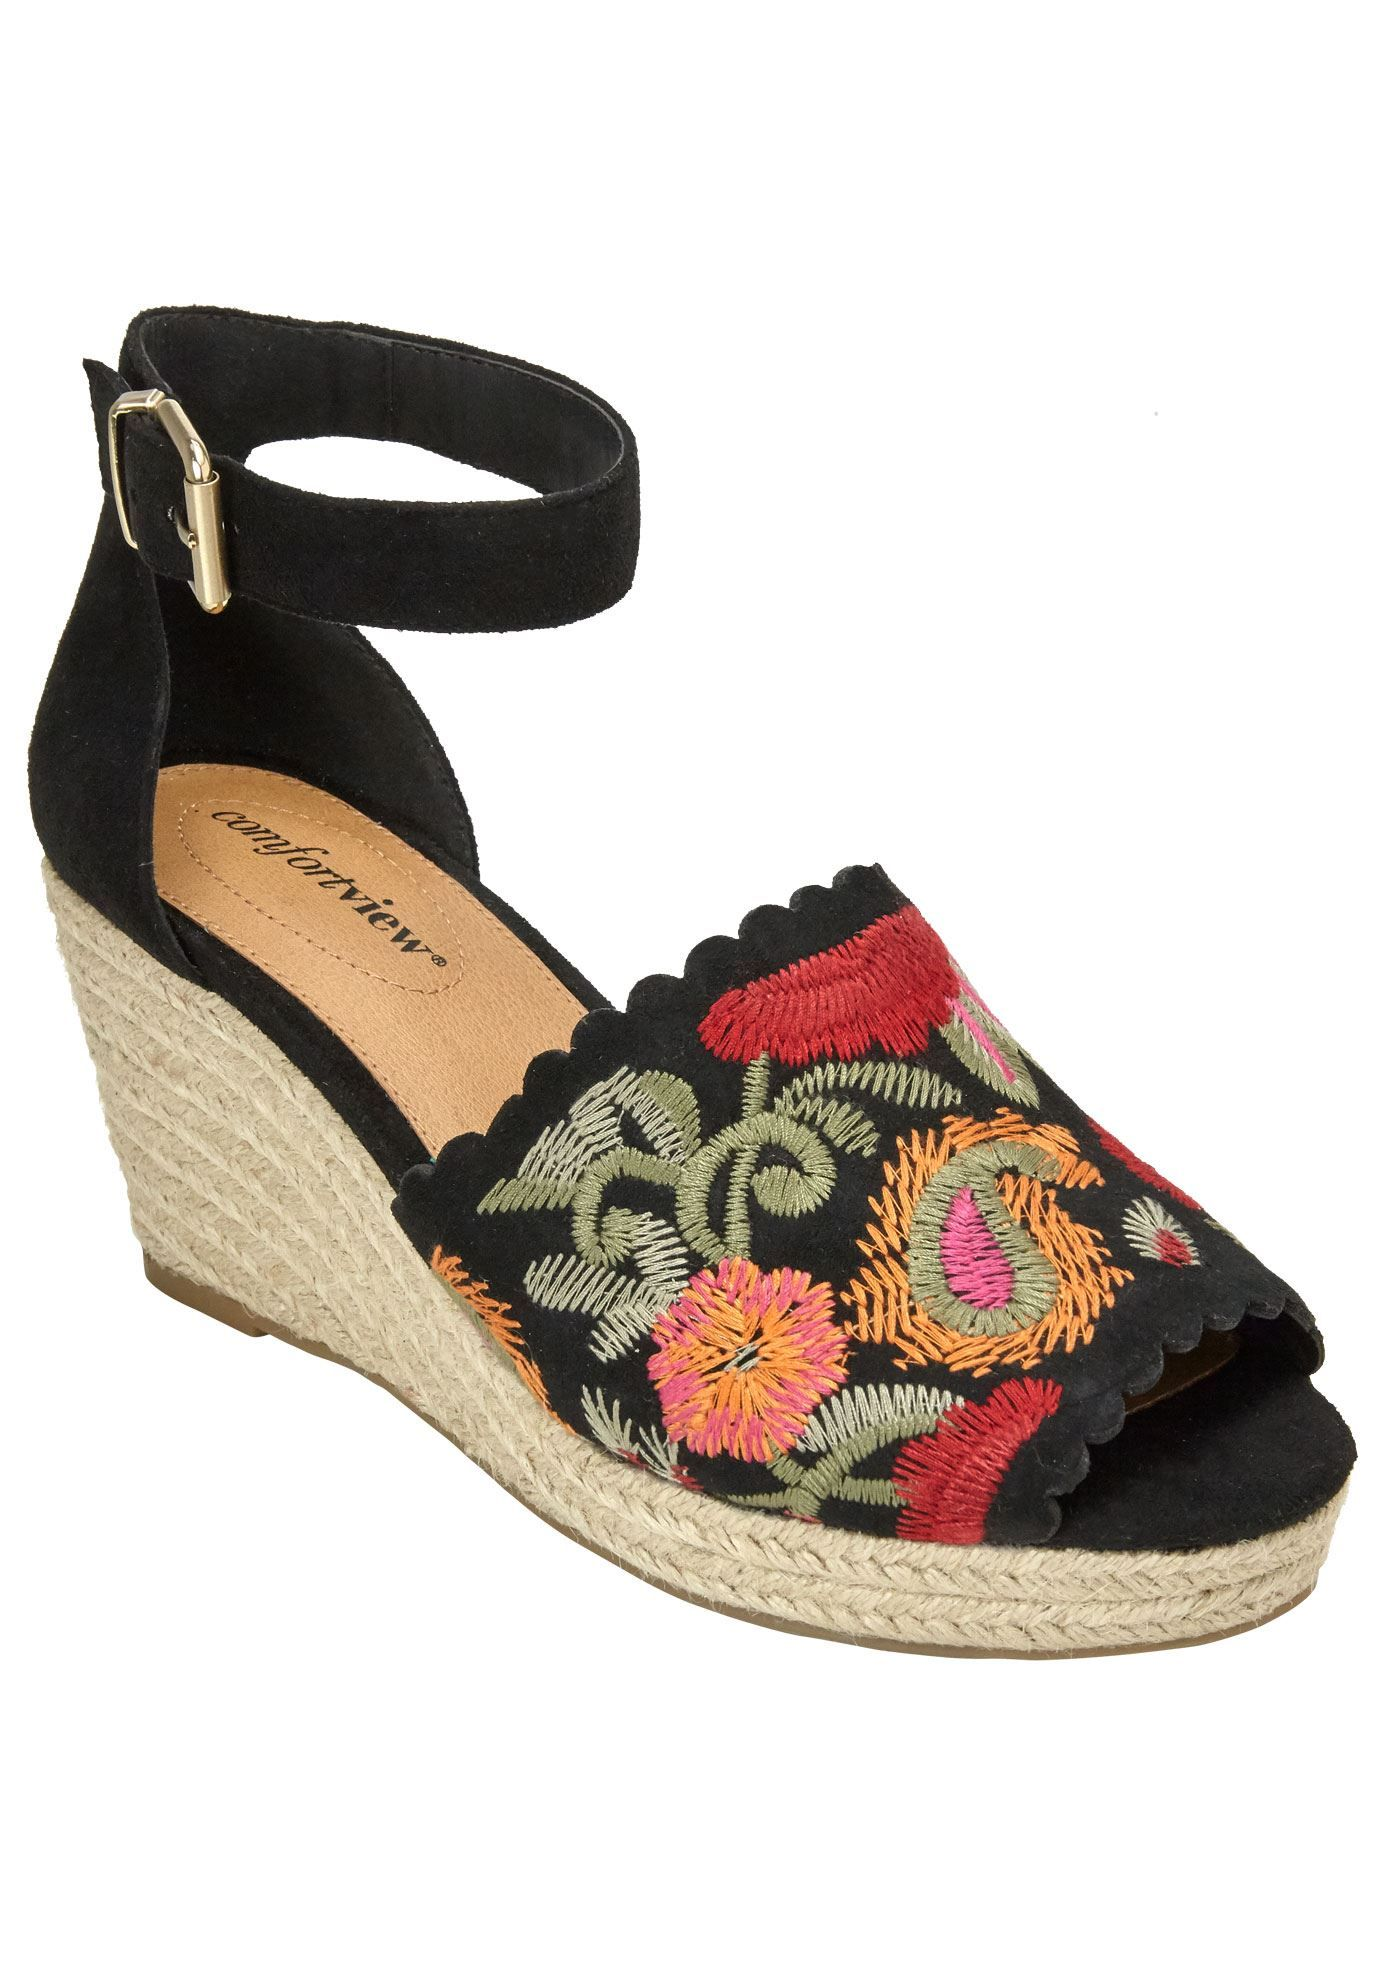 35b50fba36 Astrid Espadrilles by Comfortview - Women's Plus Size Clothing Espadrille  Wedge, Slingback Sandal, Wedge